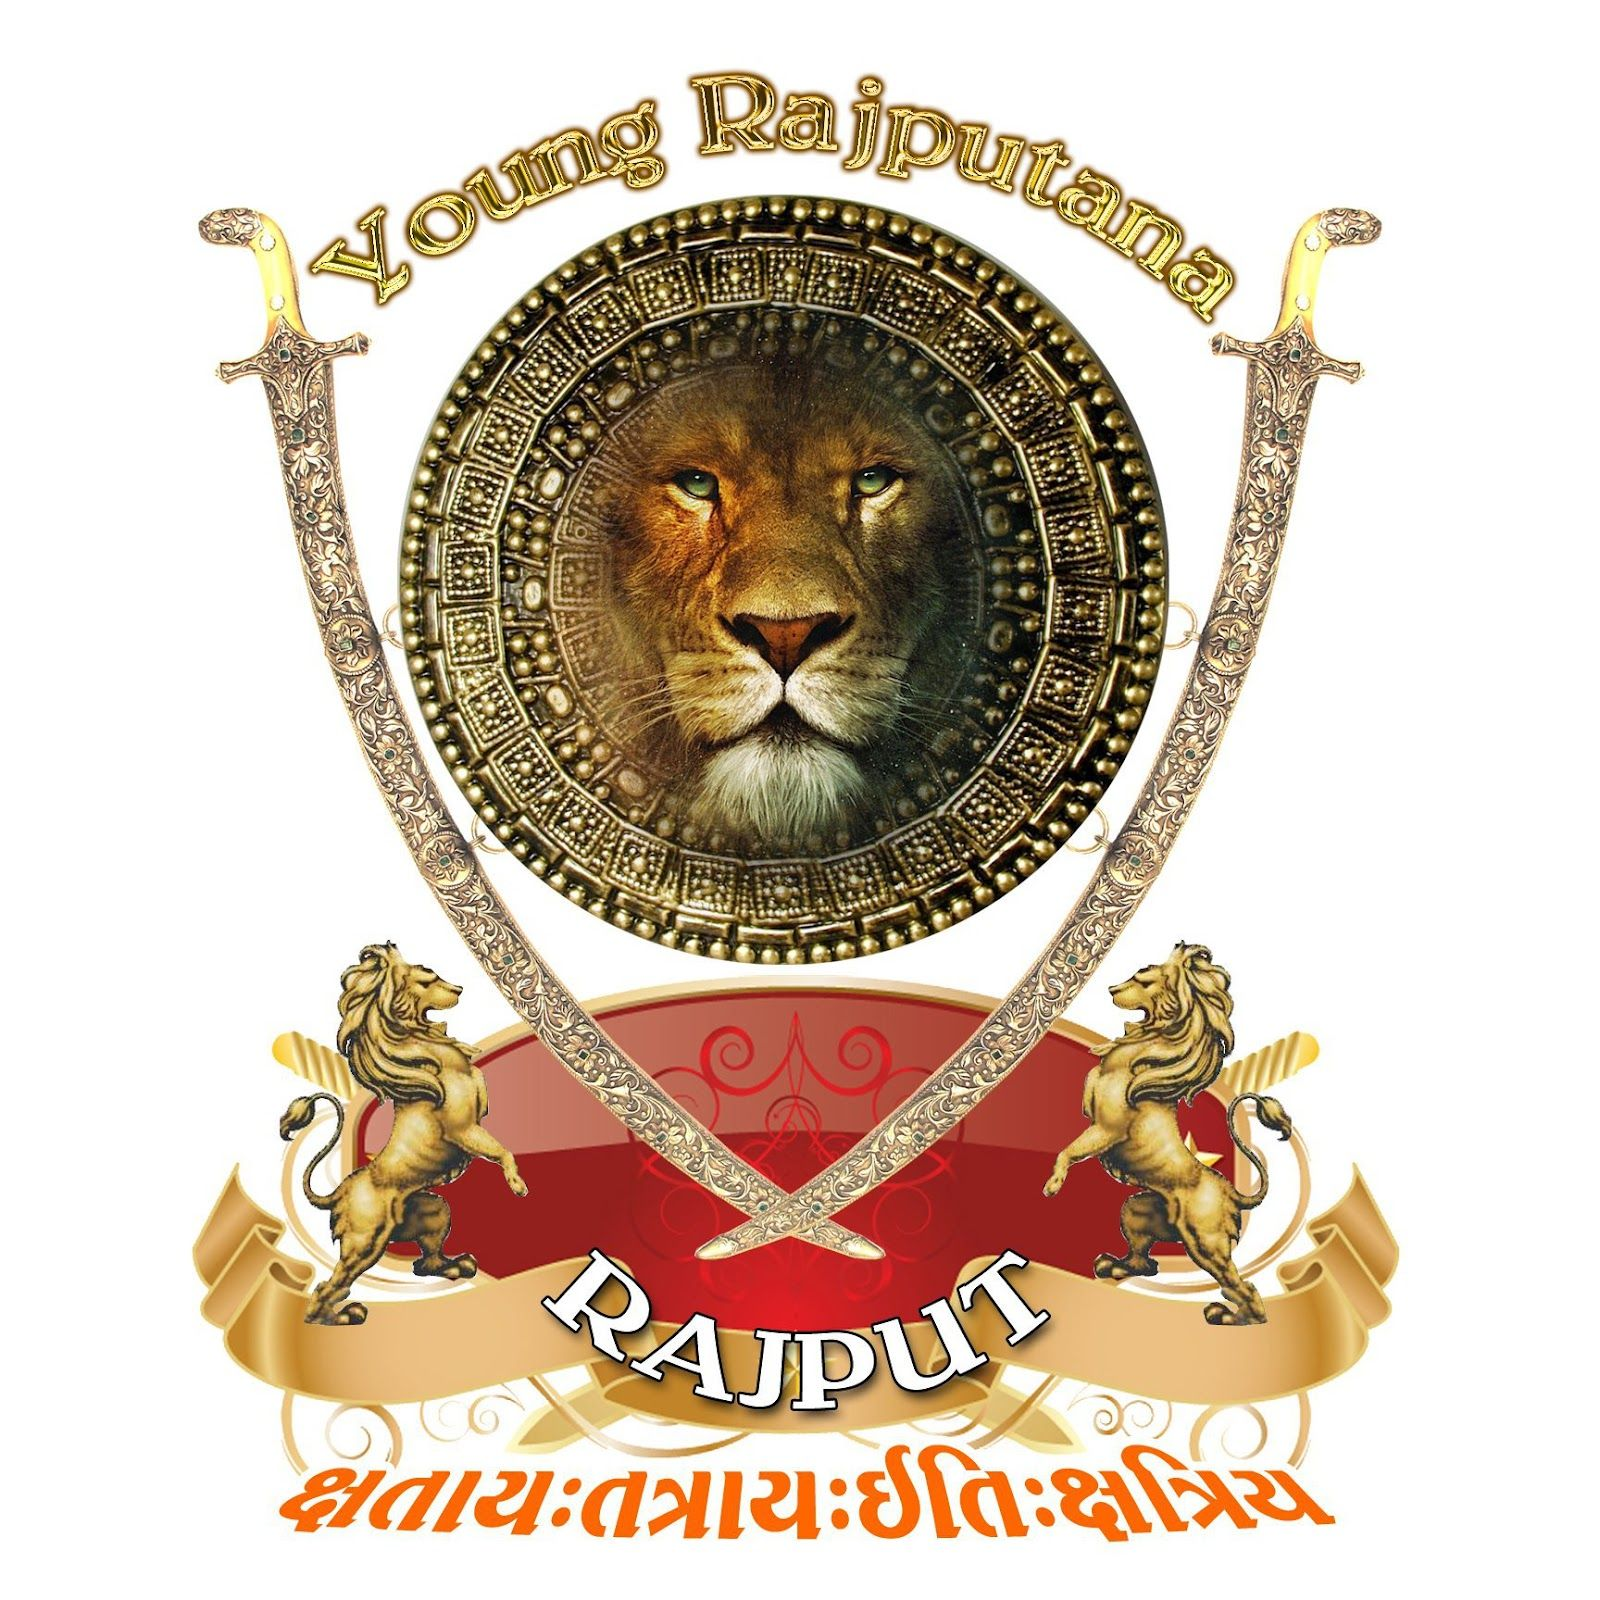 Vani 3d Name Wallpapers Chauhan Rajput Logo And Symbol Jairajputana T Shirt In